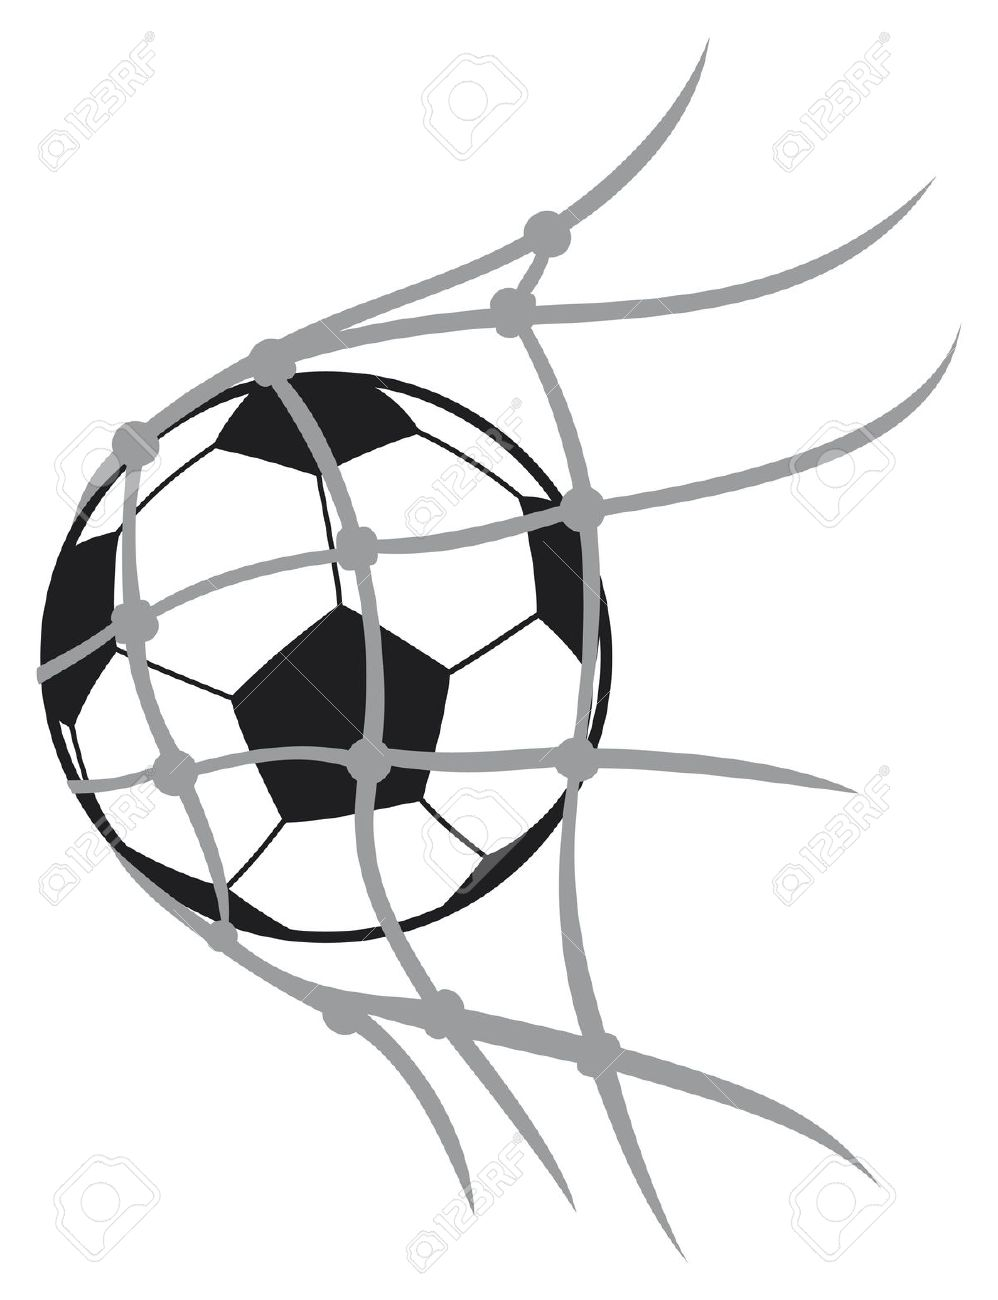 998x1300 Drawn Ball Soccer Goal Post